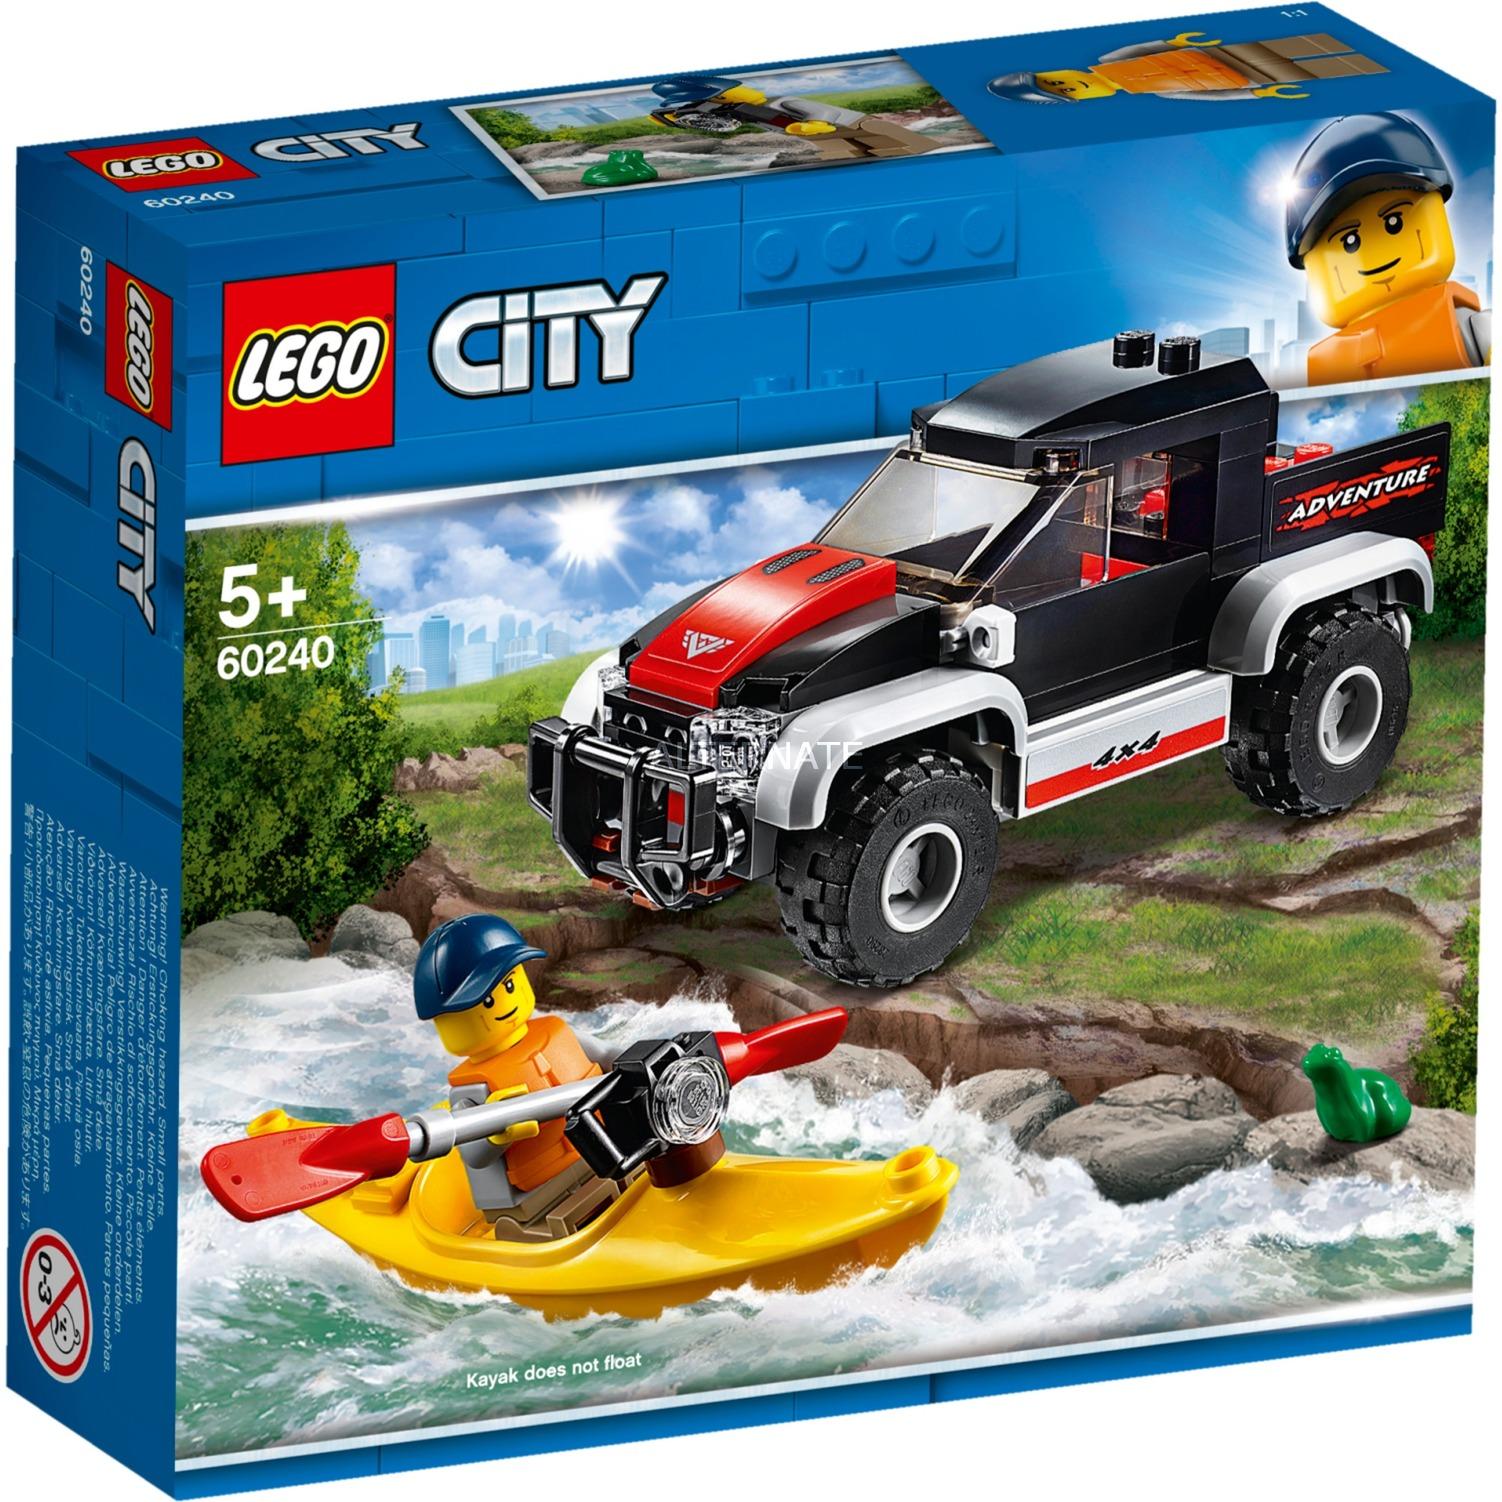 LEGO City - Aventura en Kayak - 60240